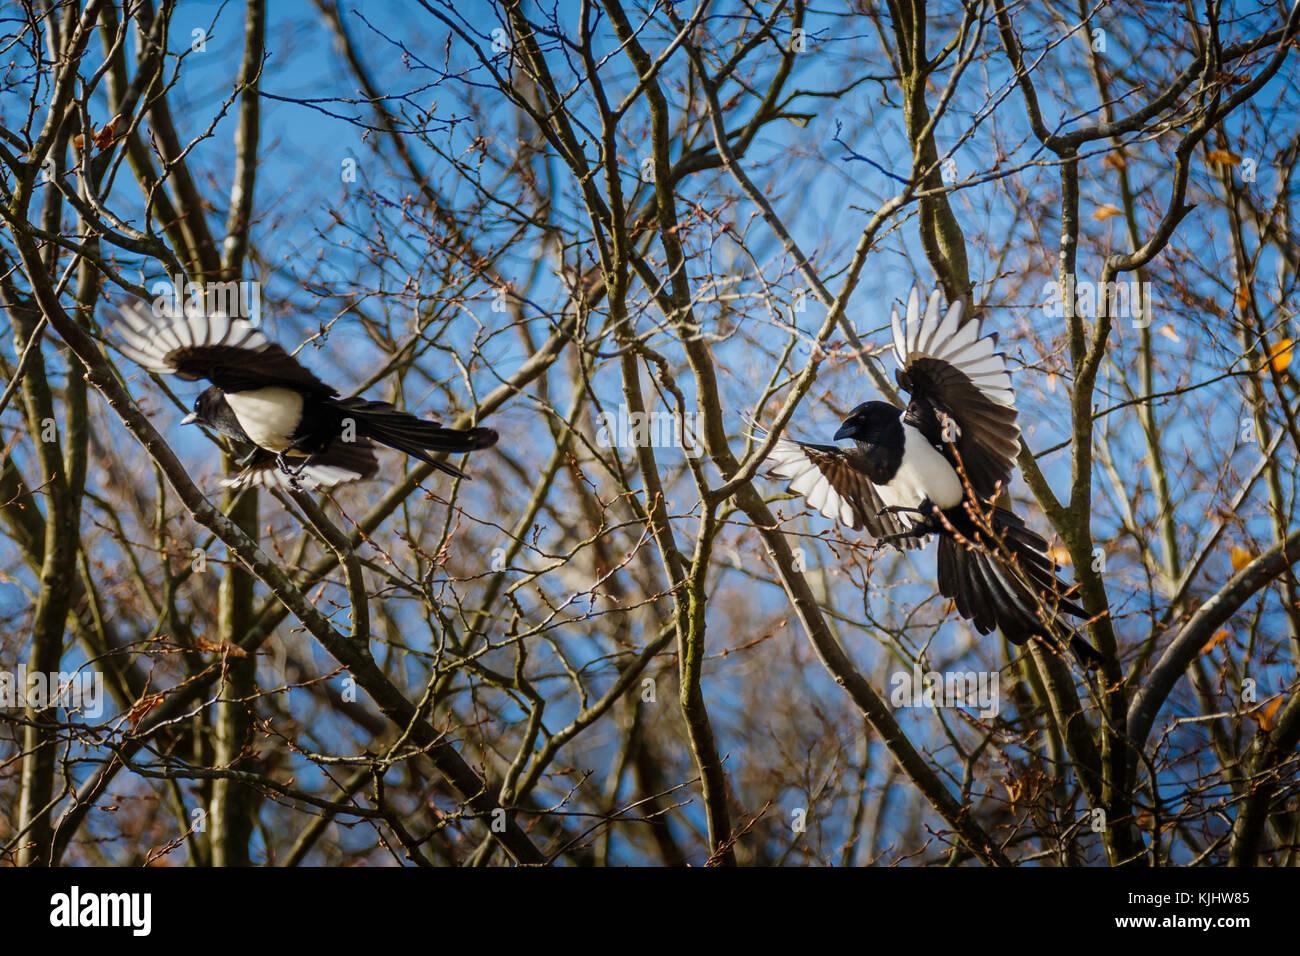 Magpies, Barn Hill, Wembley Park - Stock Image